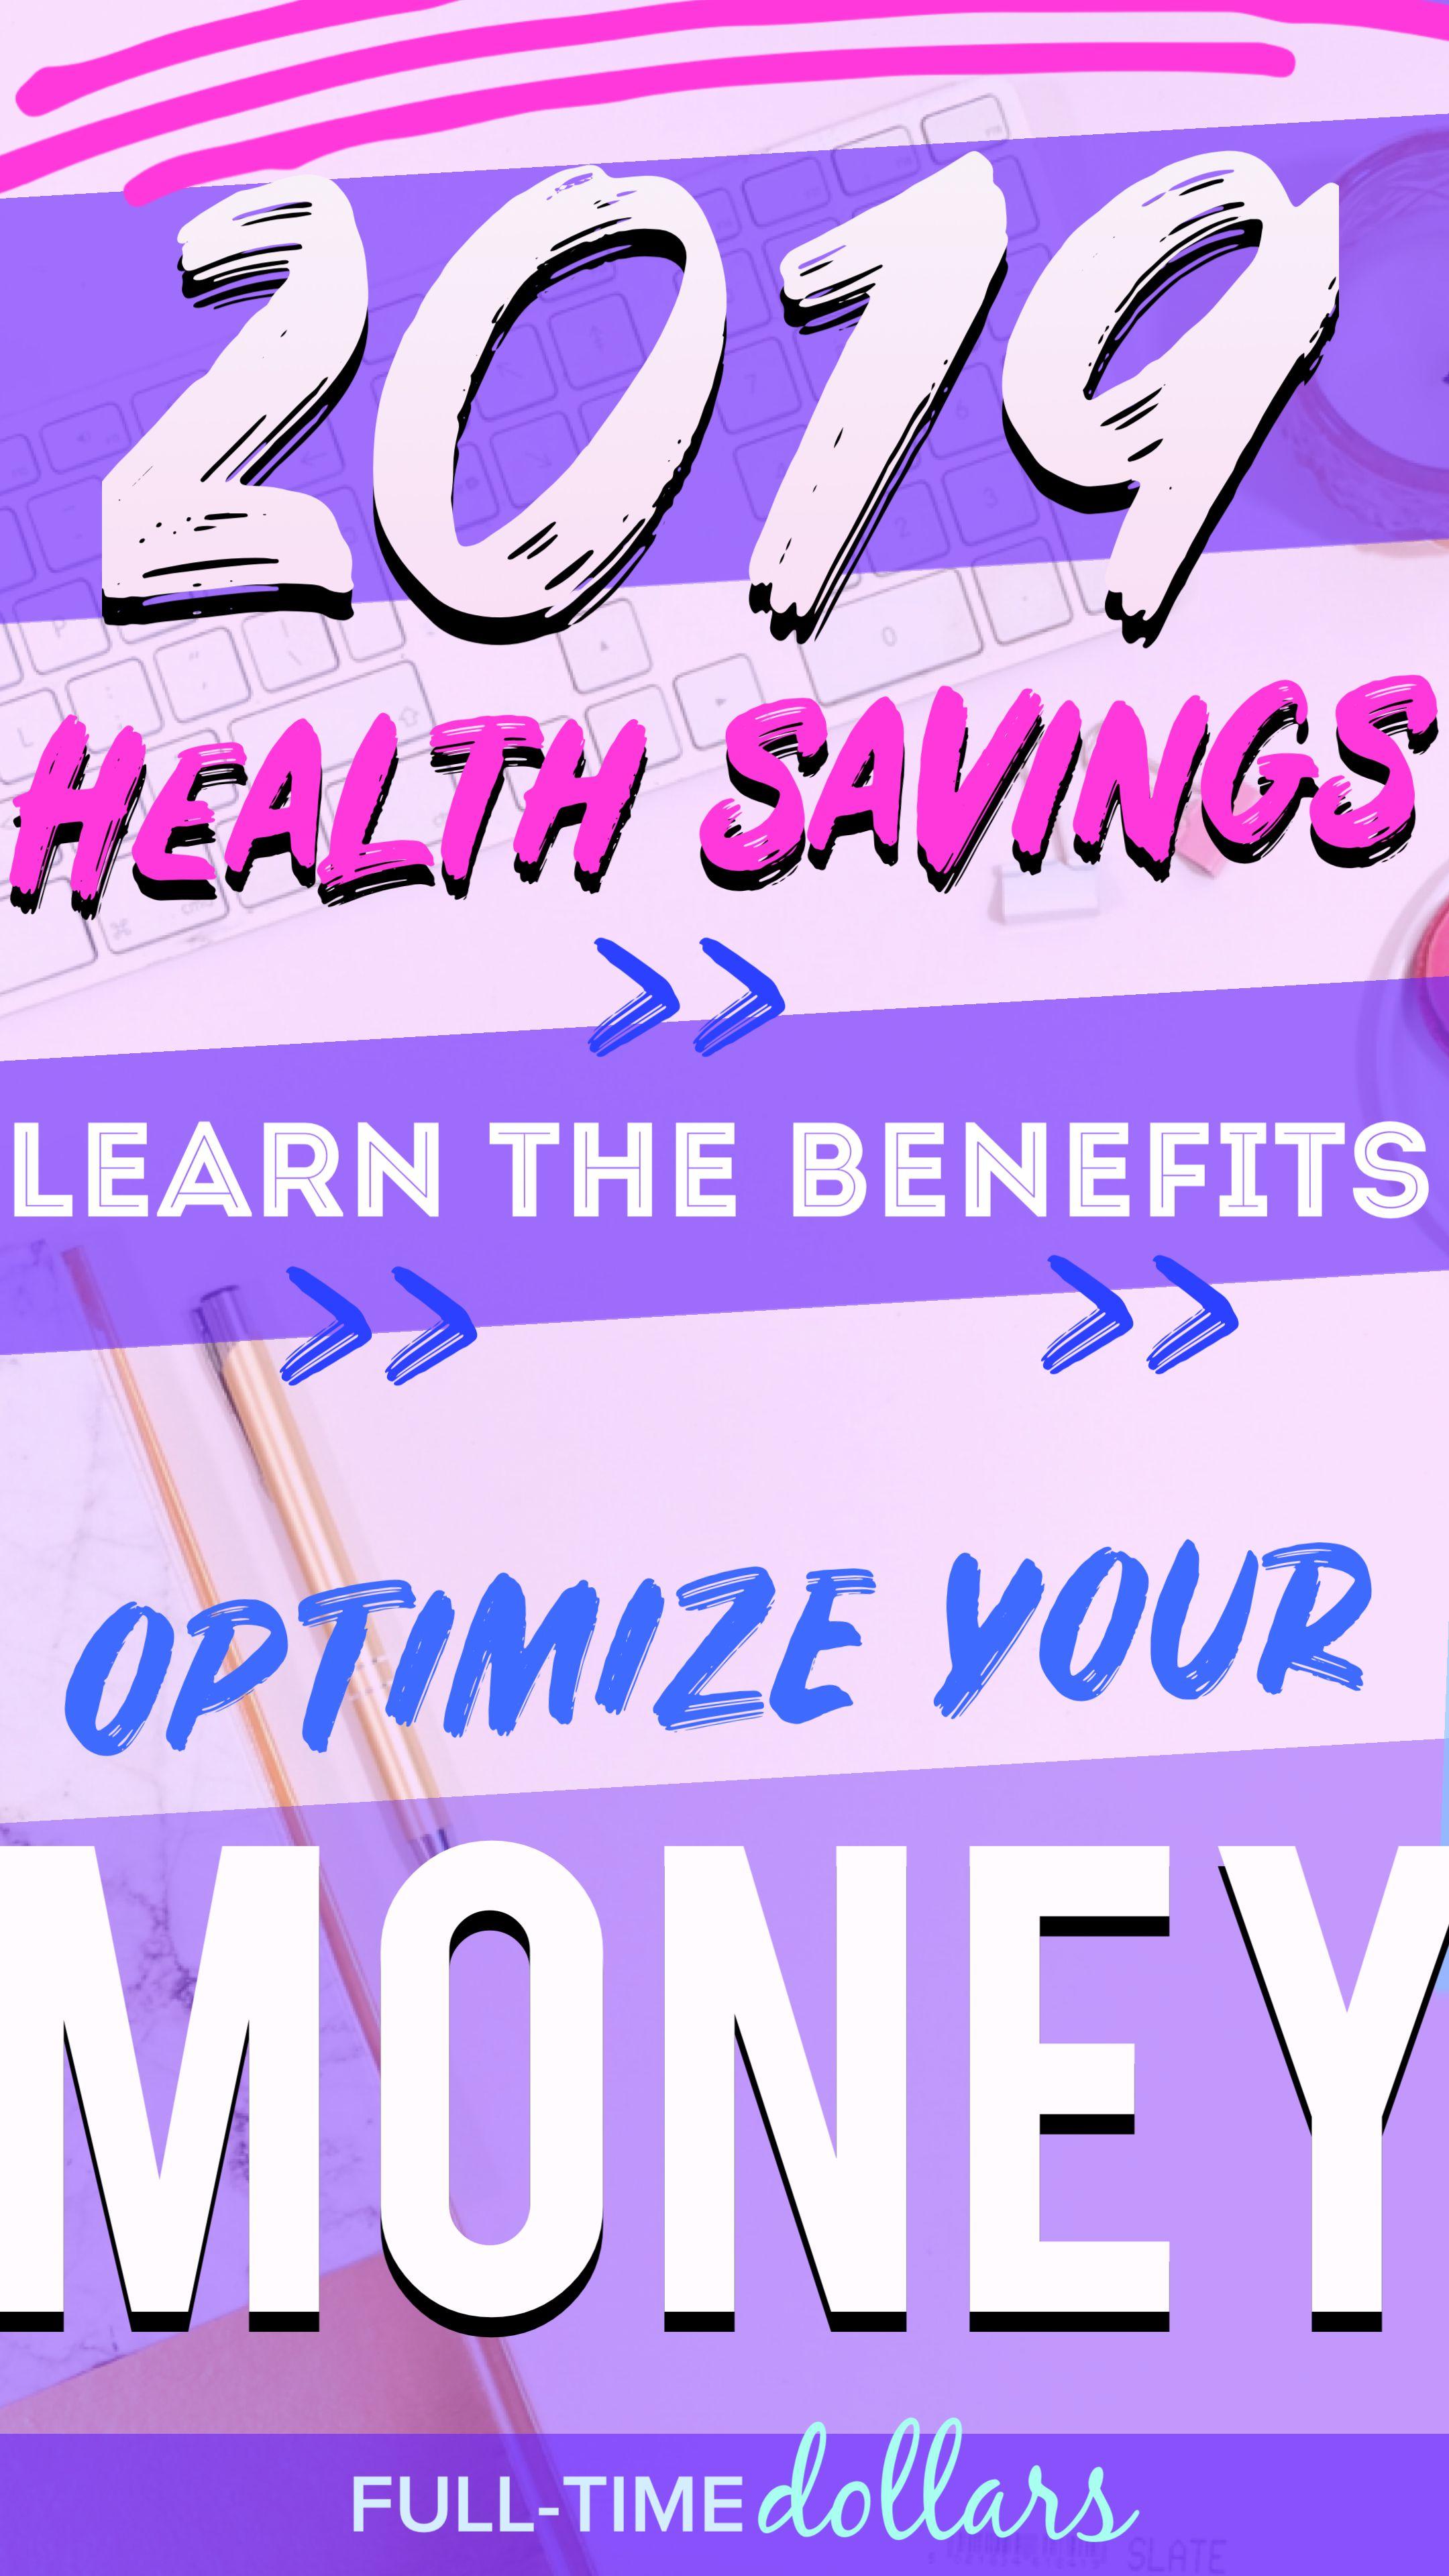 Top 7 Hsa Benefits Health Savings Account Advantages Full Time Dollars Health Savings Account Money Basics Money Management